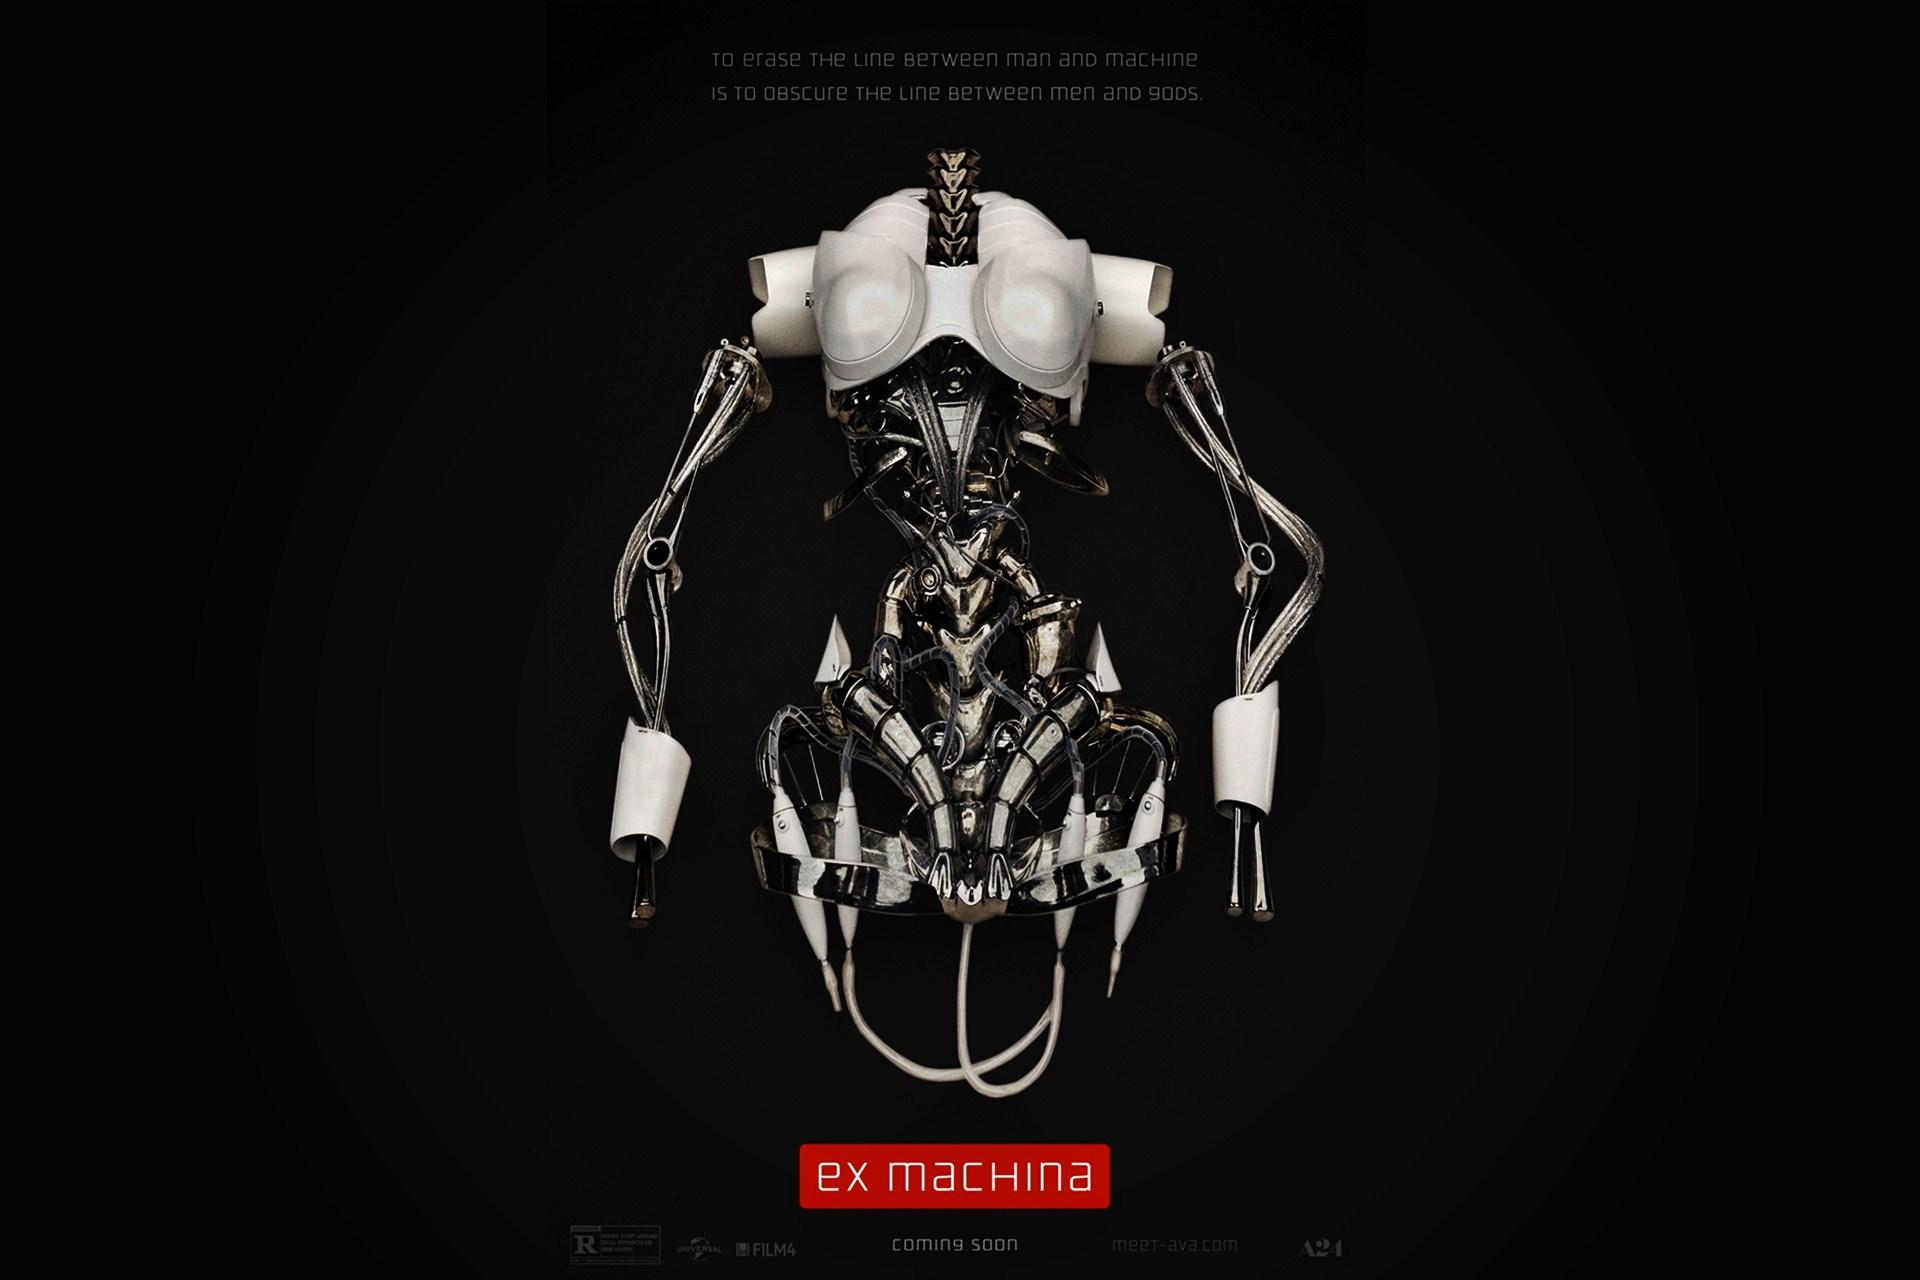 HD Ex Machina Movie Wallpapers - HDWallSource.com